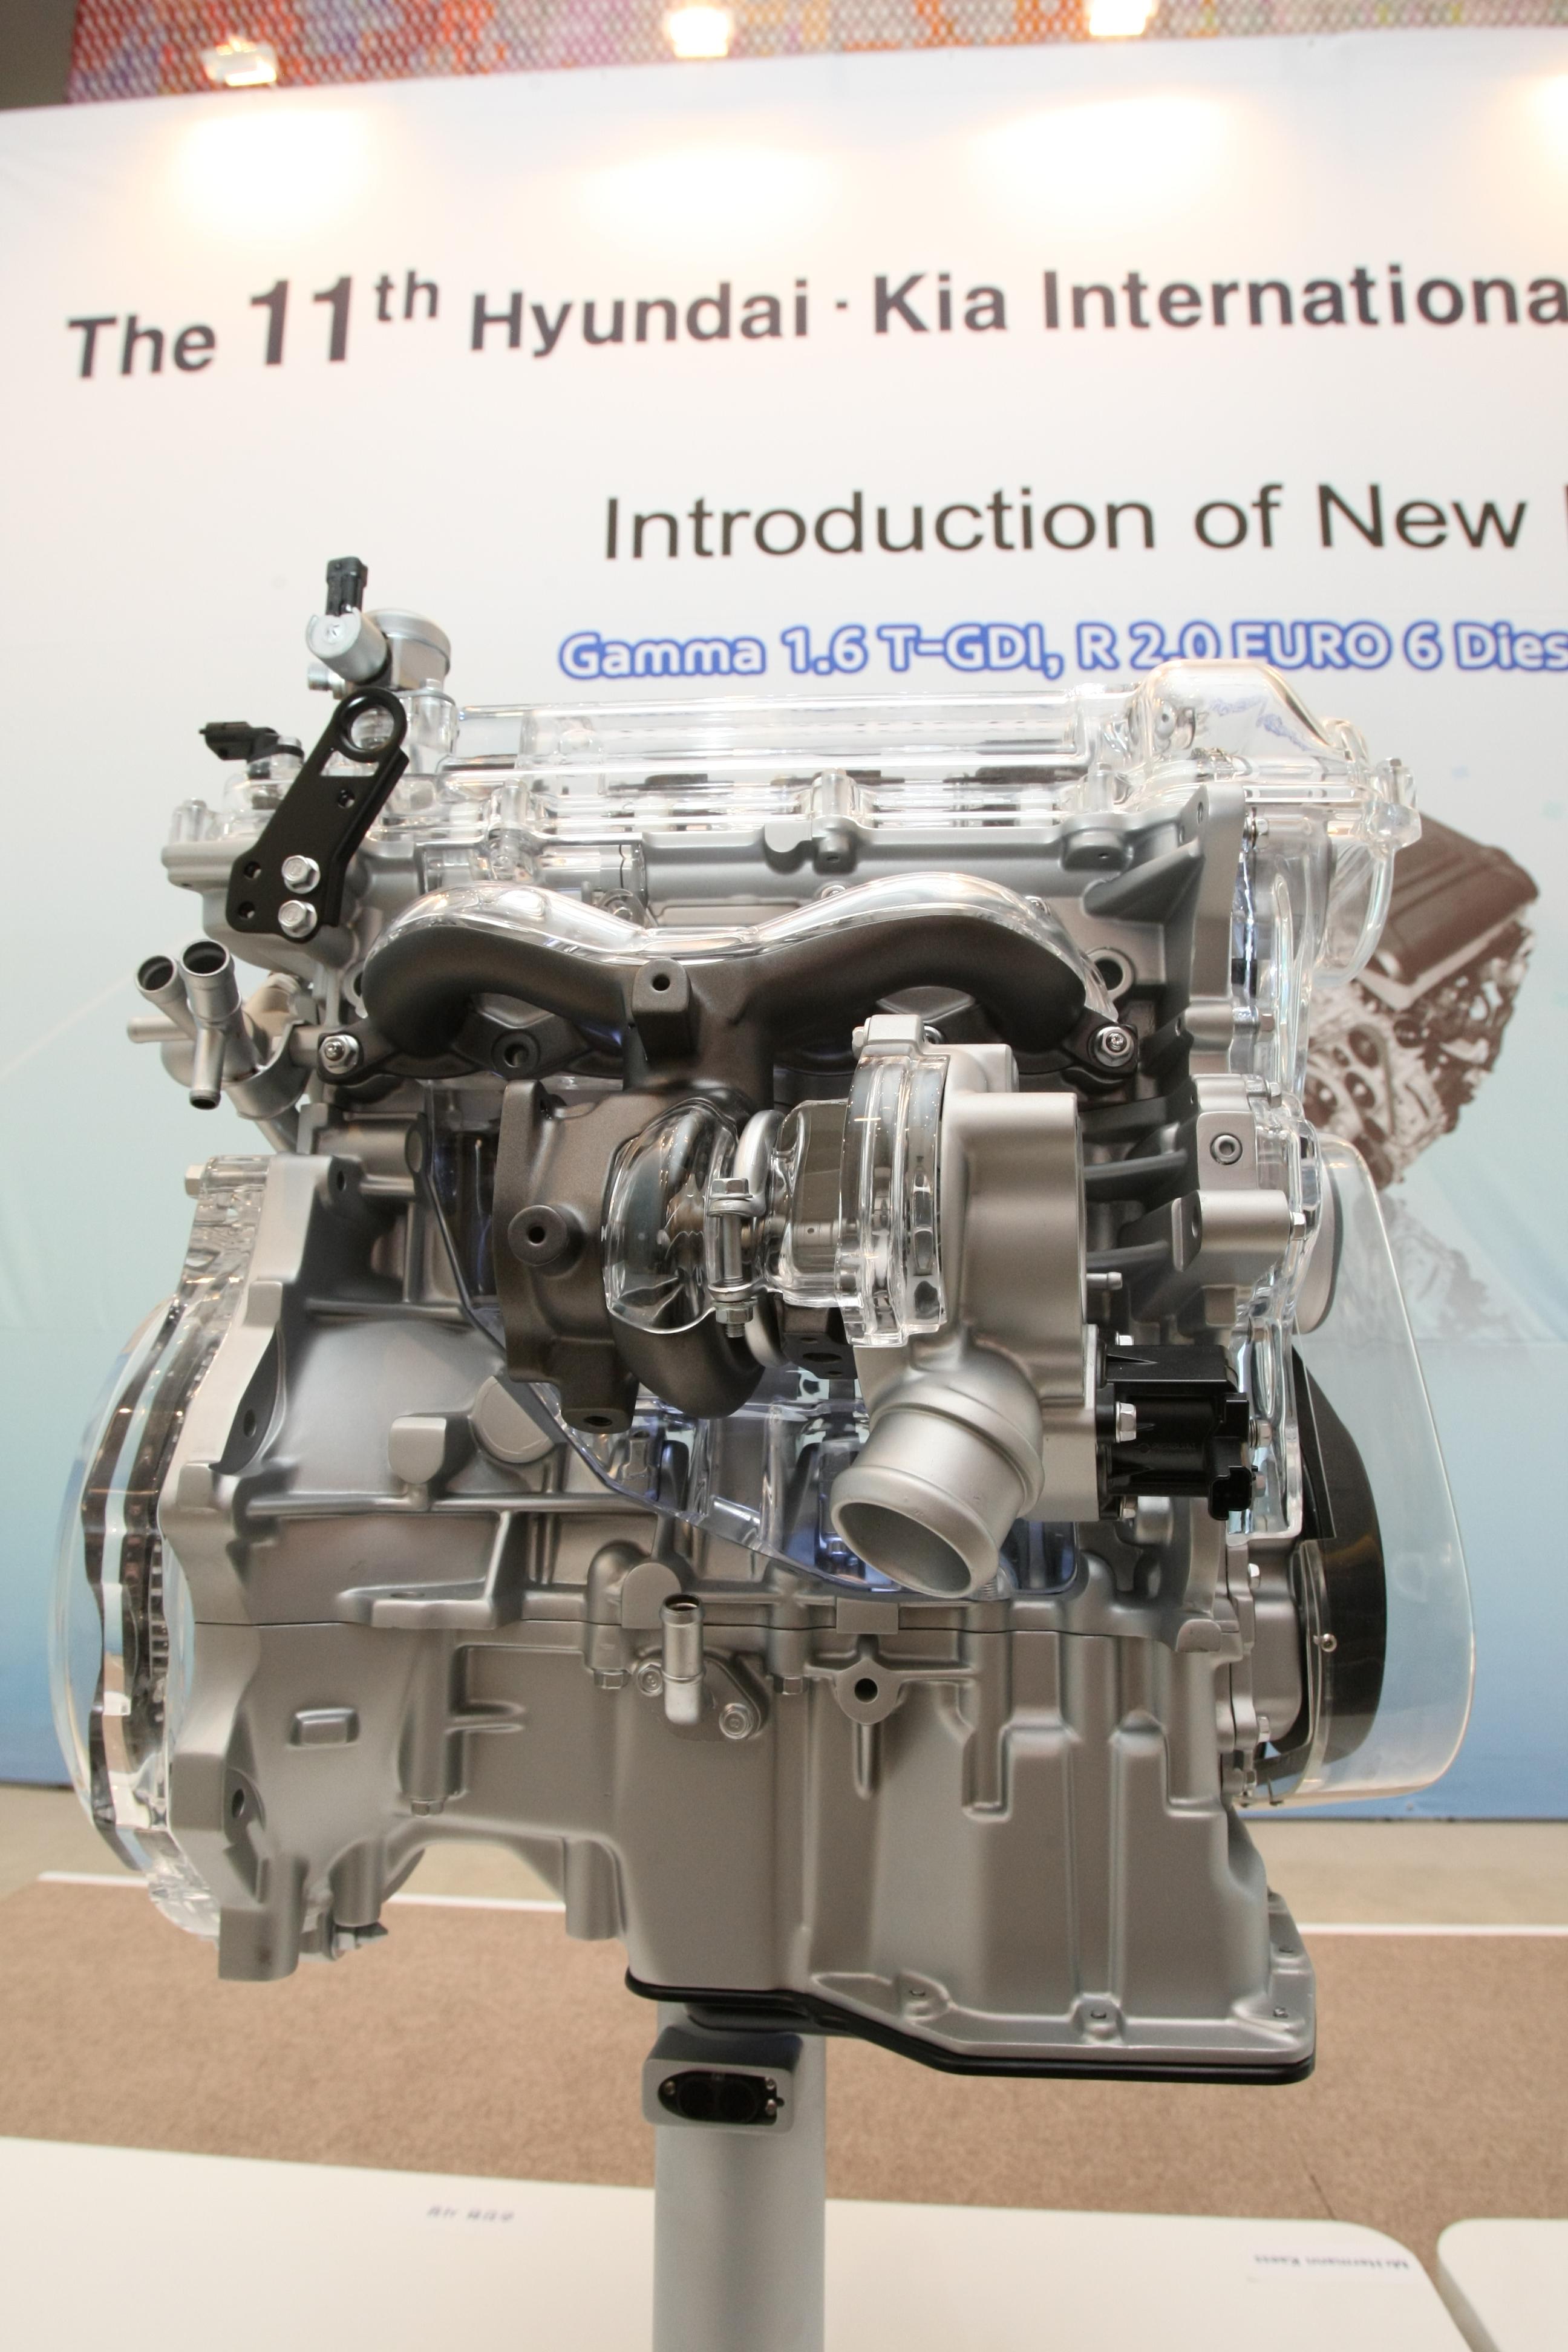 Hyundai Gdi Engine Carbon Build Up